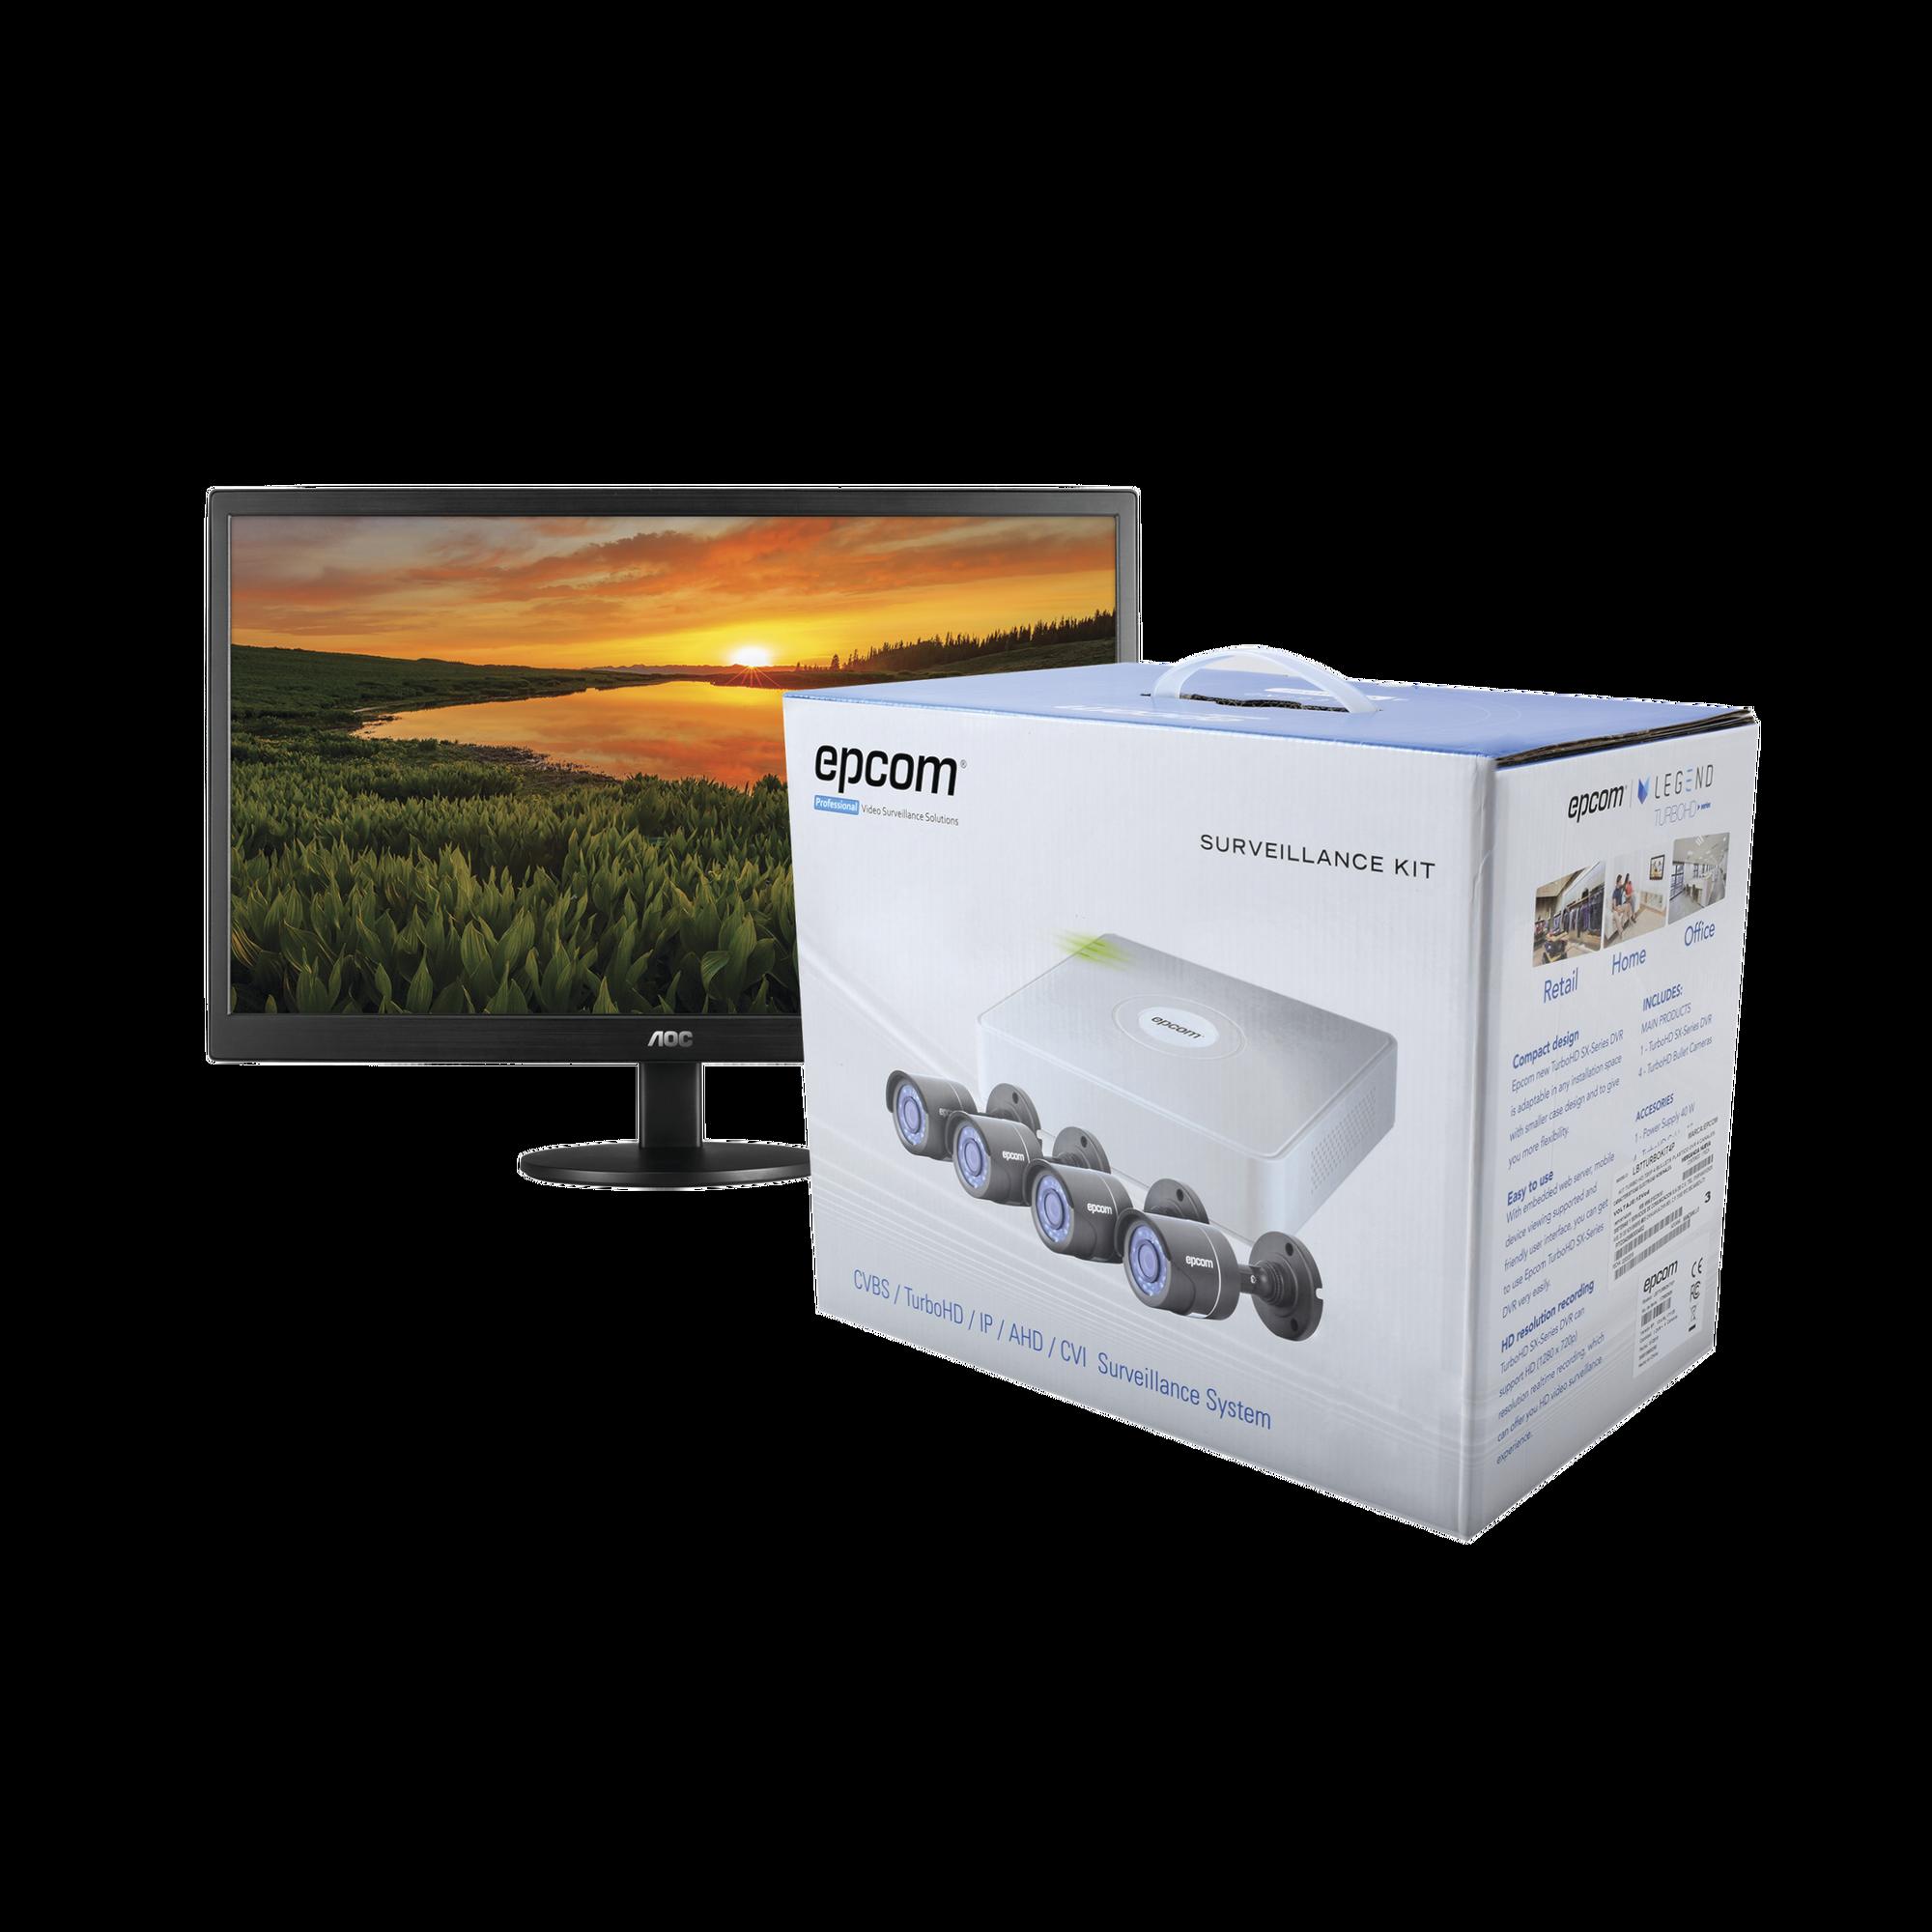 Sistema Completo de CCTV 720p / Hik-Connect / DVR 4 Canales / 4 Cámaras Bala / Cables / Fuente de Poder Profesional + 1 Monitor 16 USB